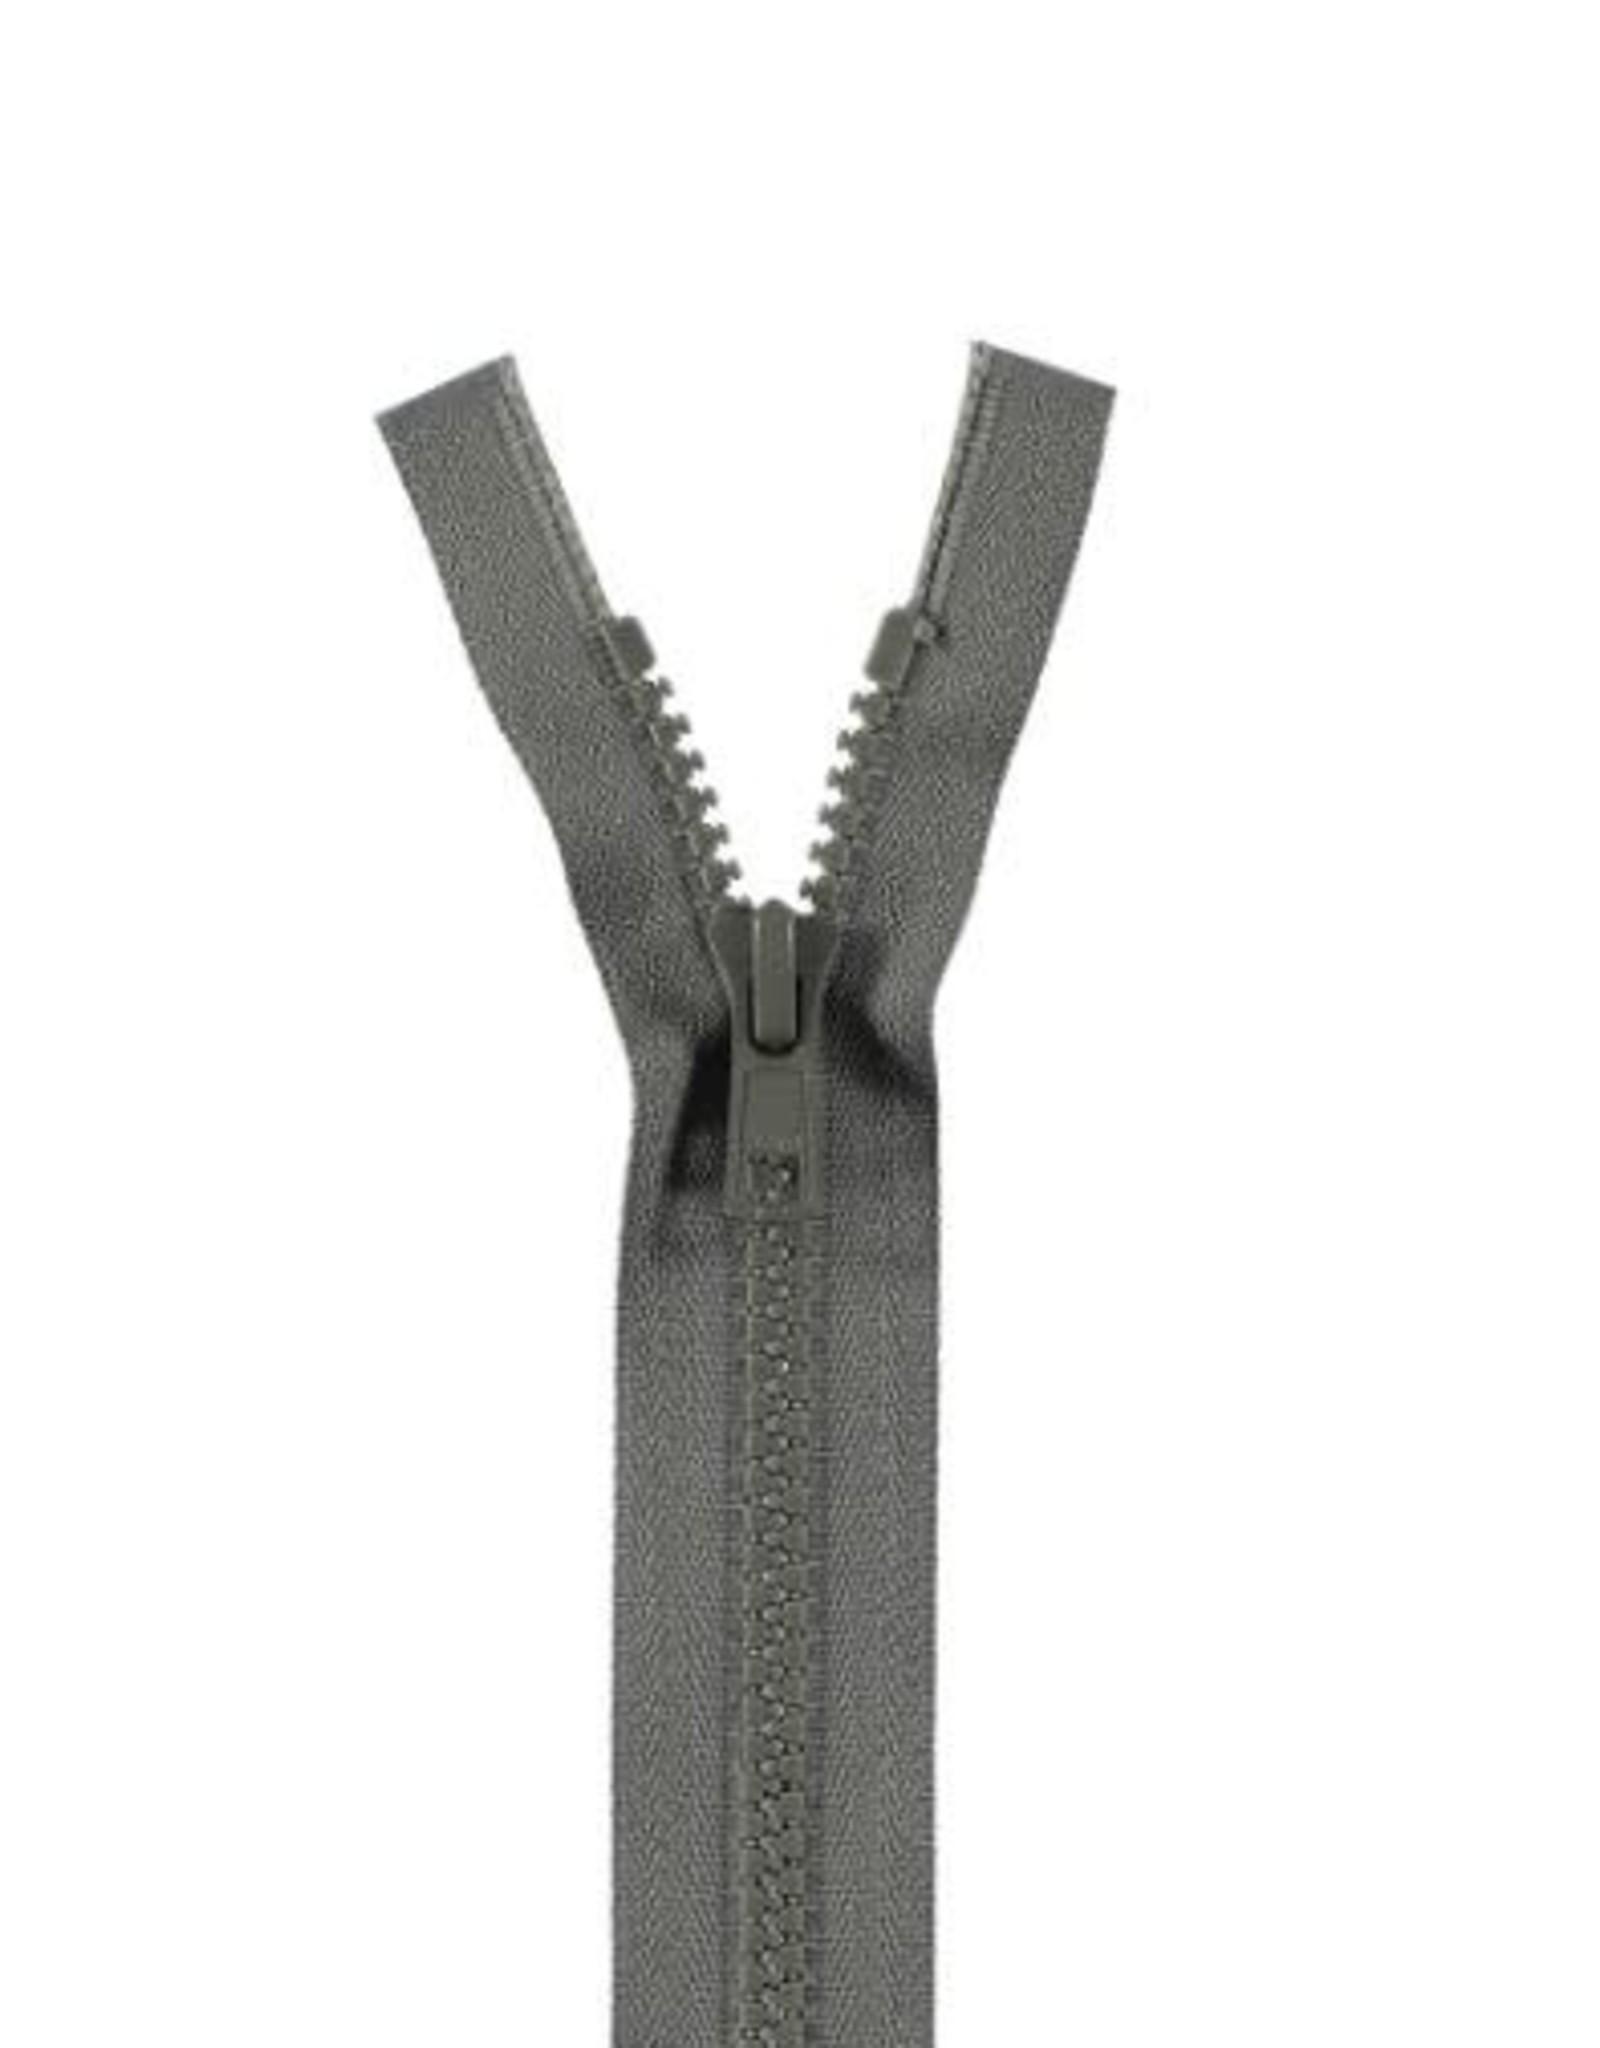 YKK BLOKRITS 5 DEELBAAR grijs 578-45cm